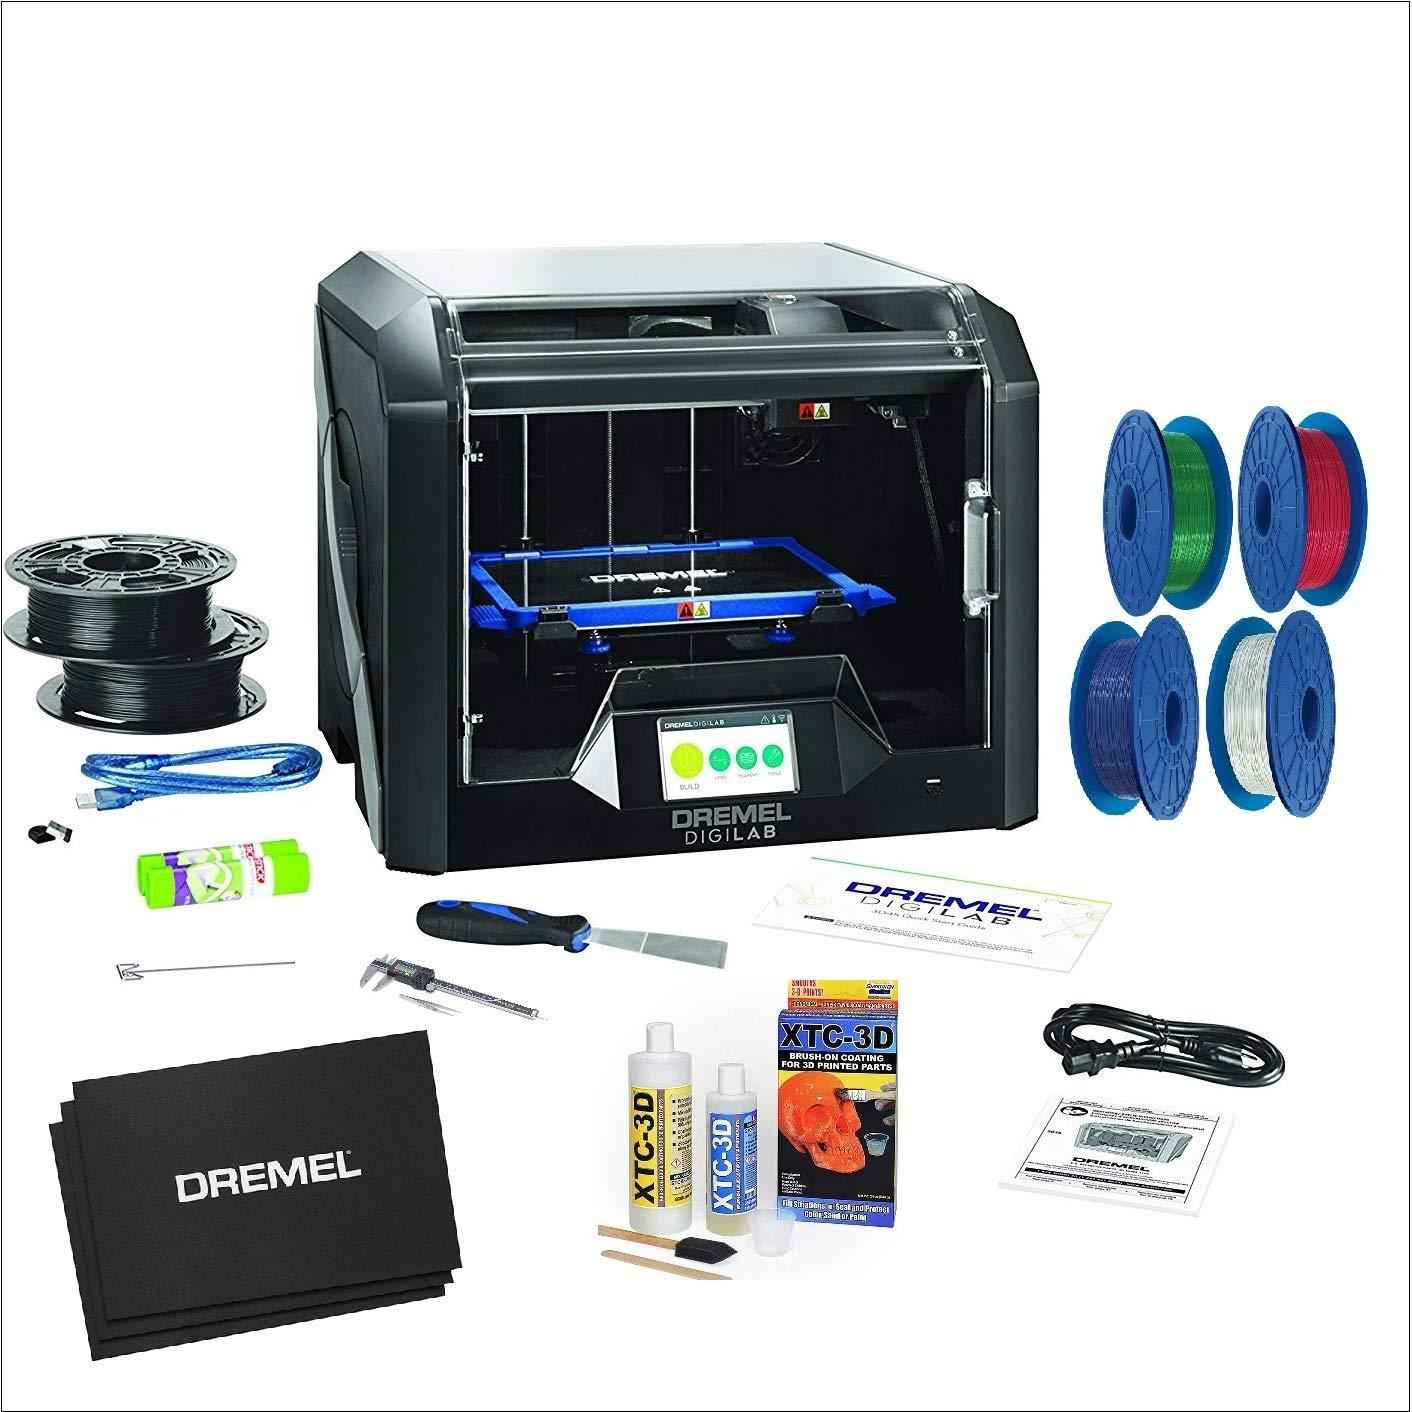 Dremel DigiLab 3D45 impresora 3D Value Bundle: Amazon.es ...